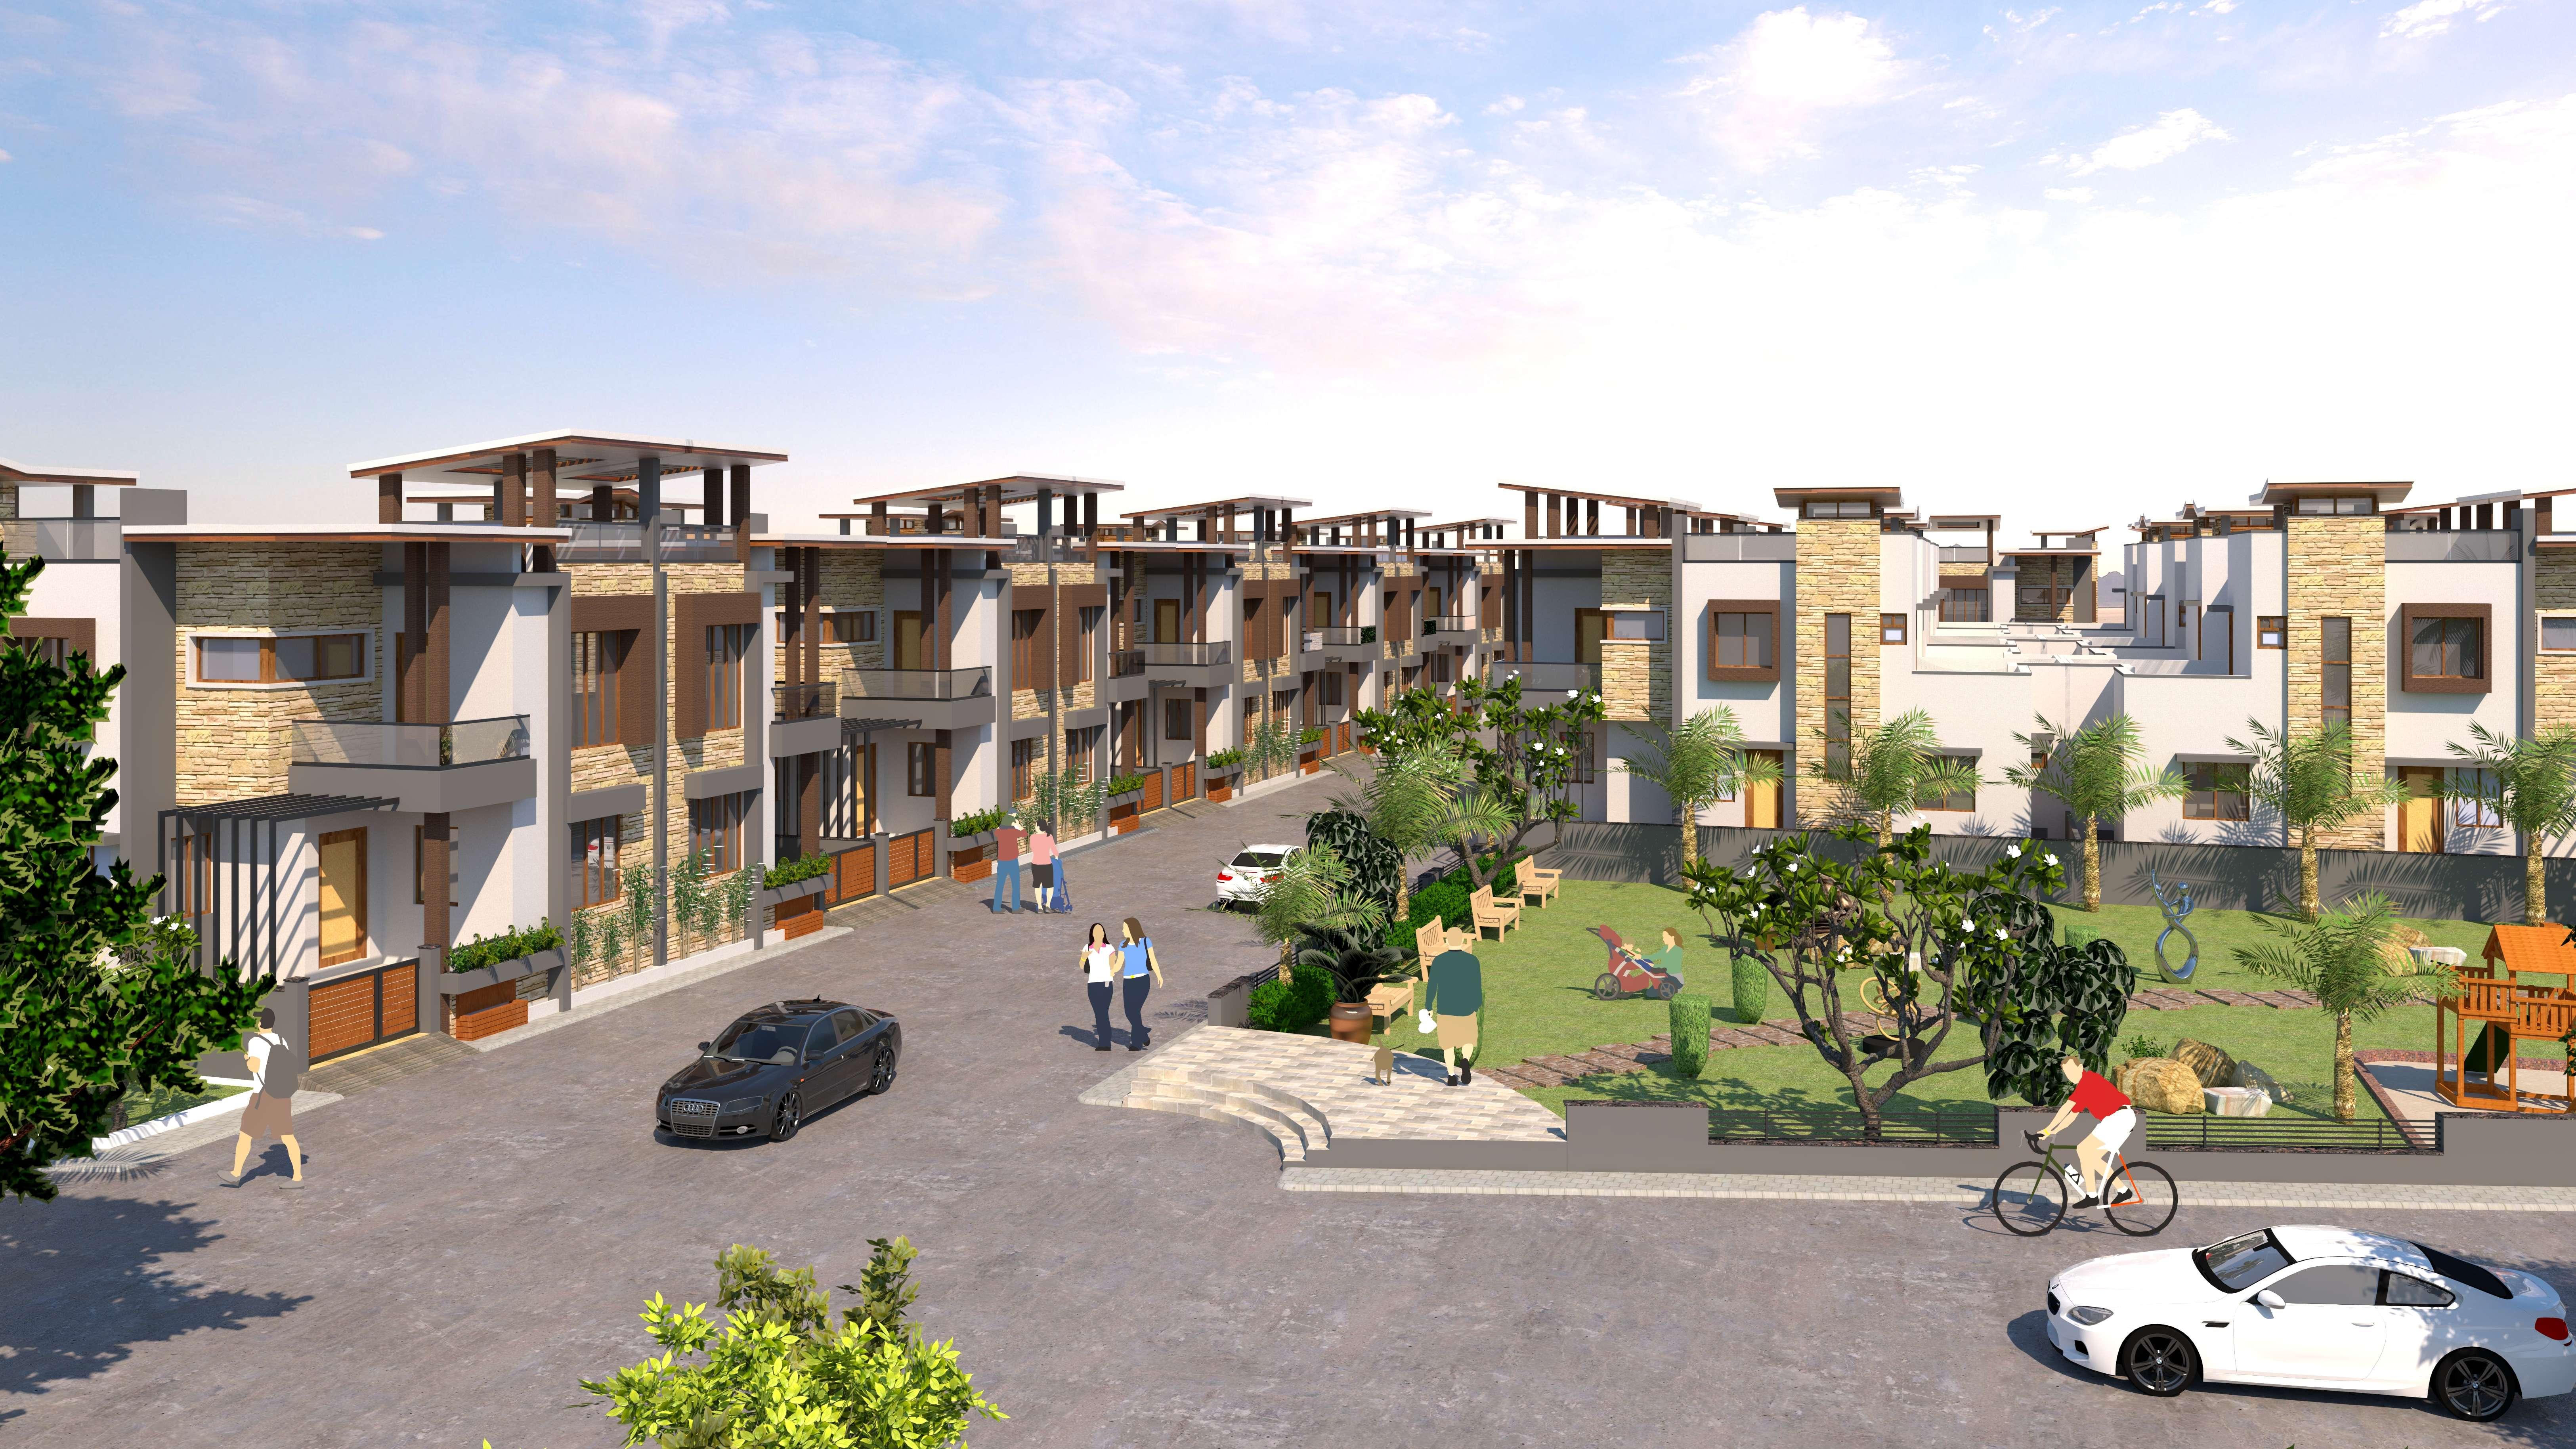 2 BHK Hayat Residency in Sarkhej